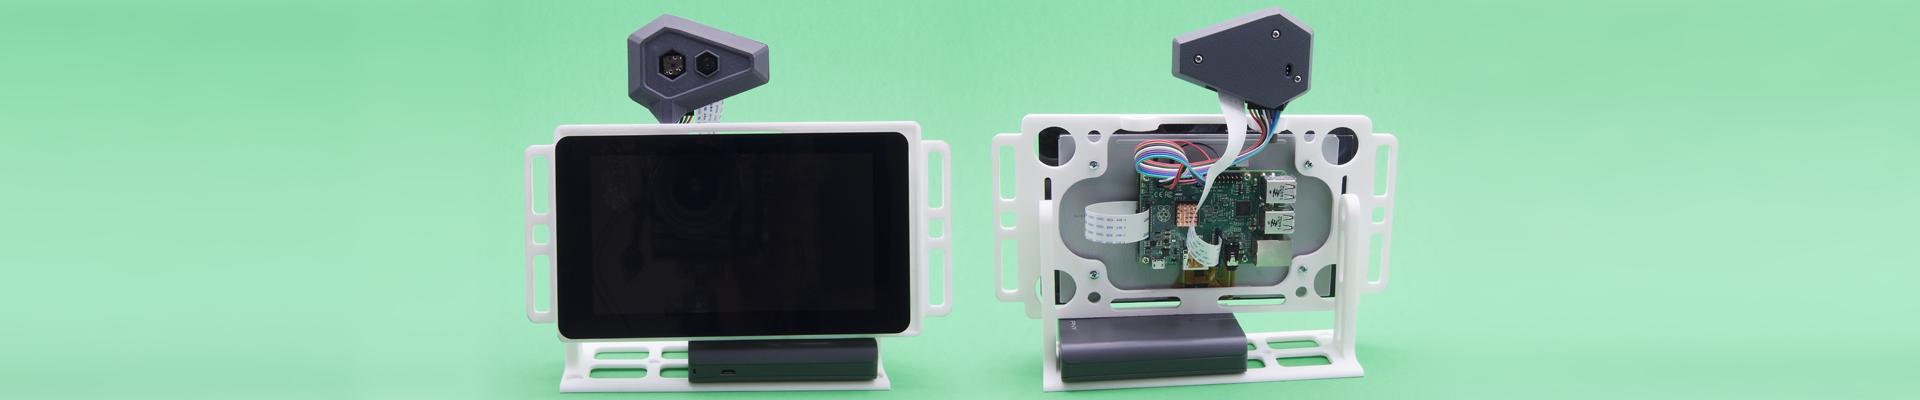 3D Printed Raspberry Pi & Screen Mount